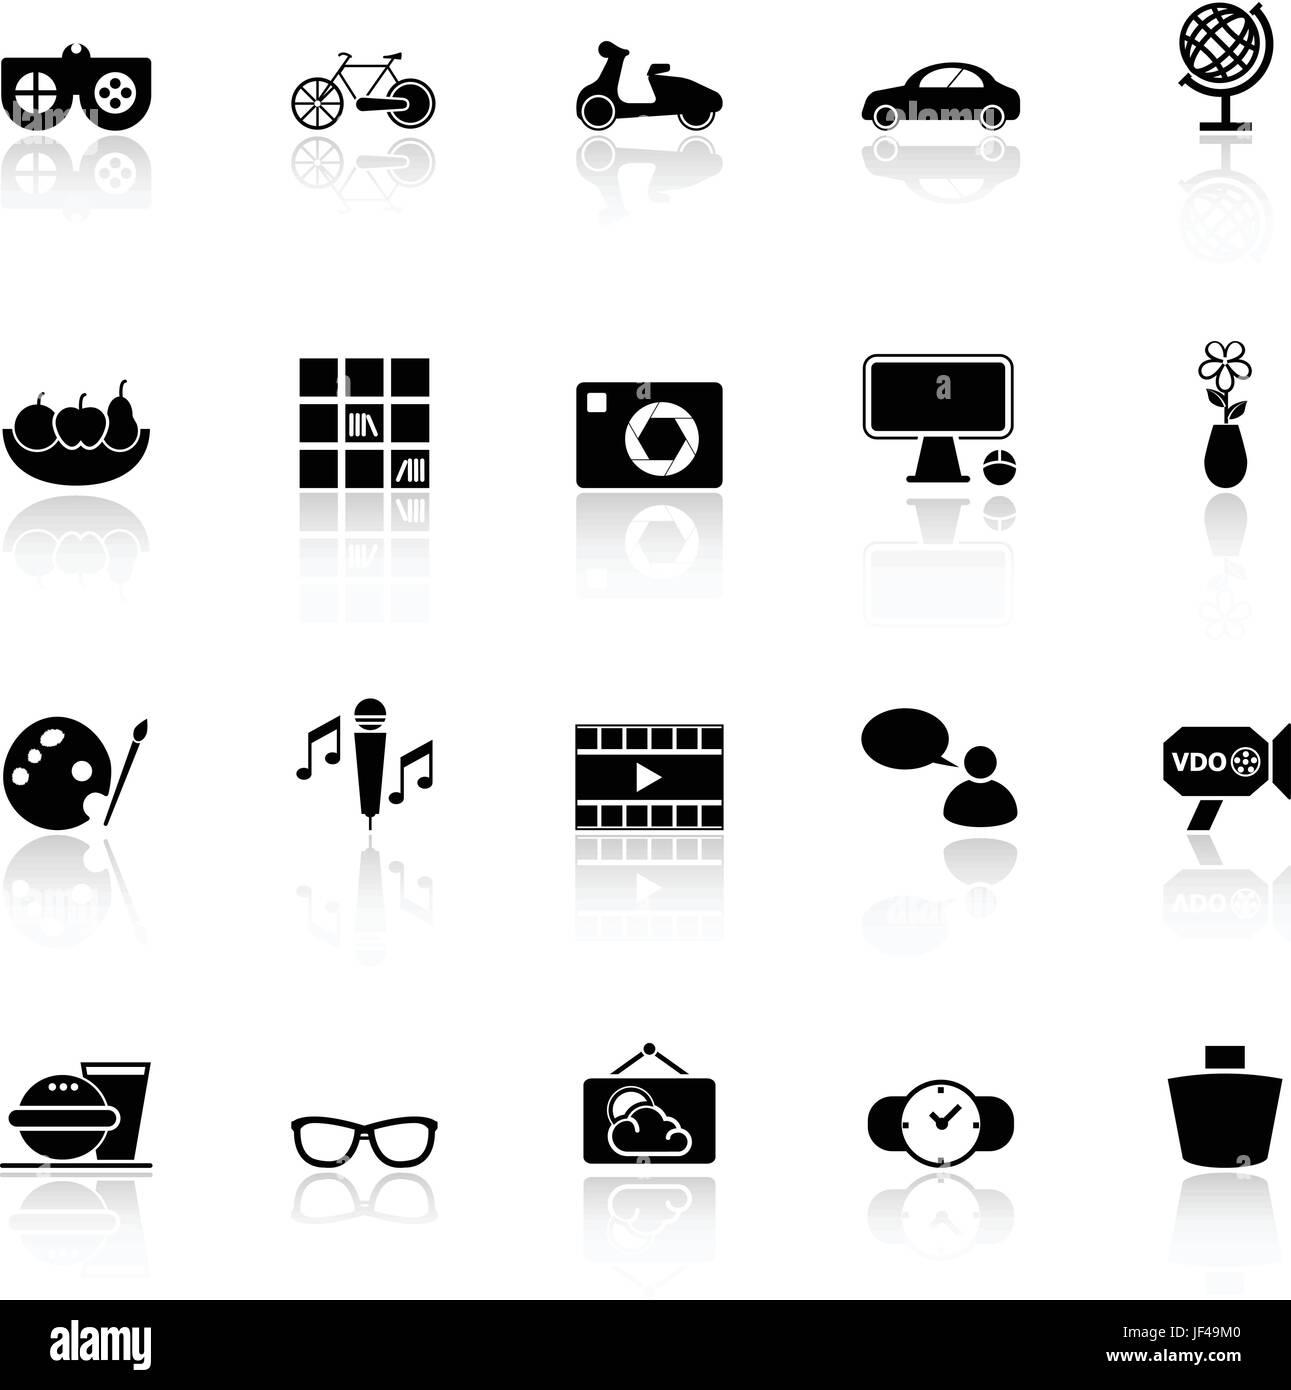 symbol pictograph - Stock Image